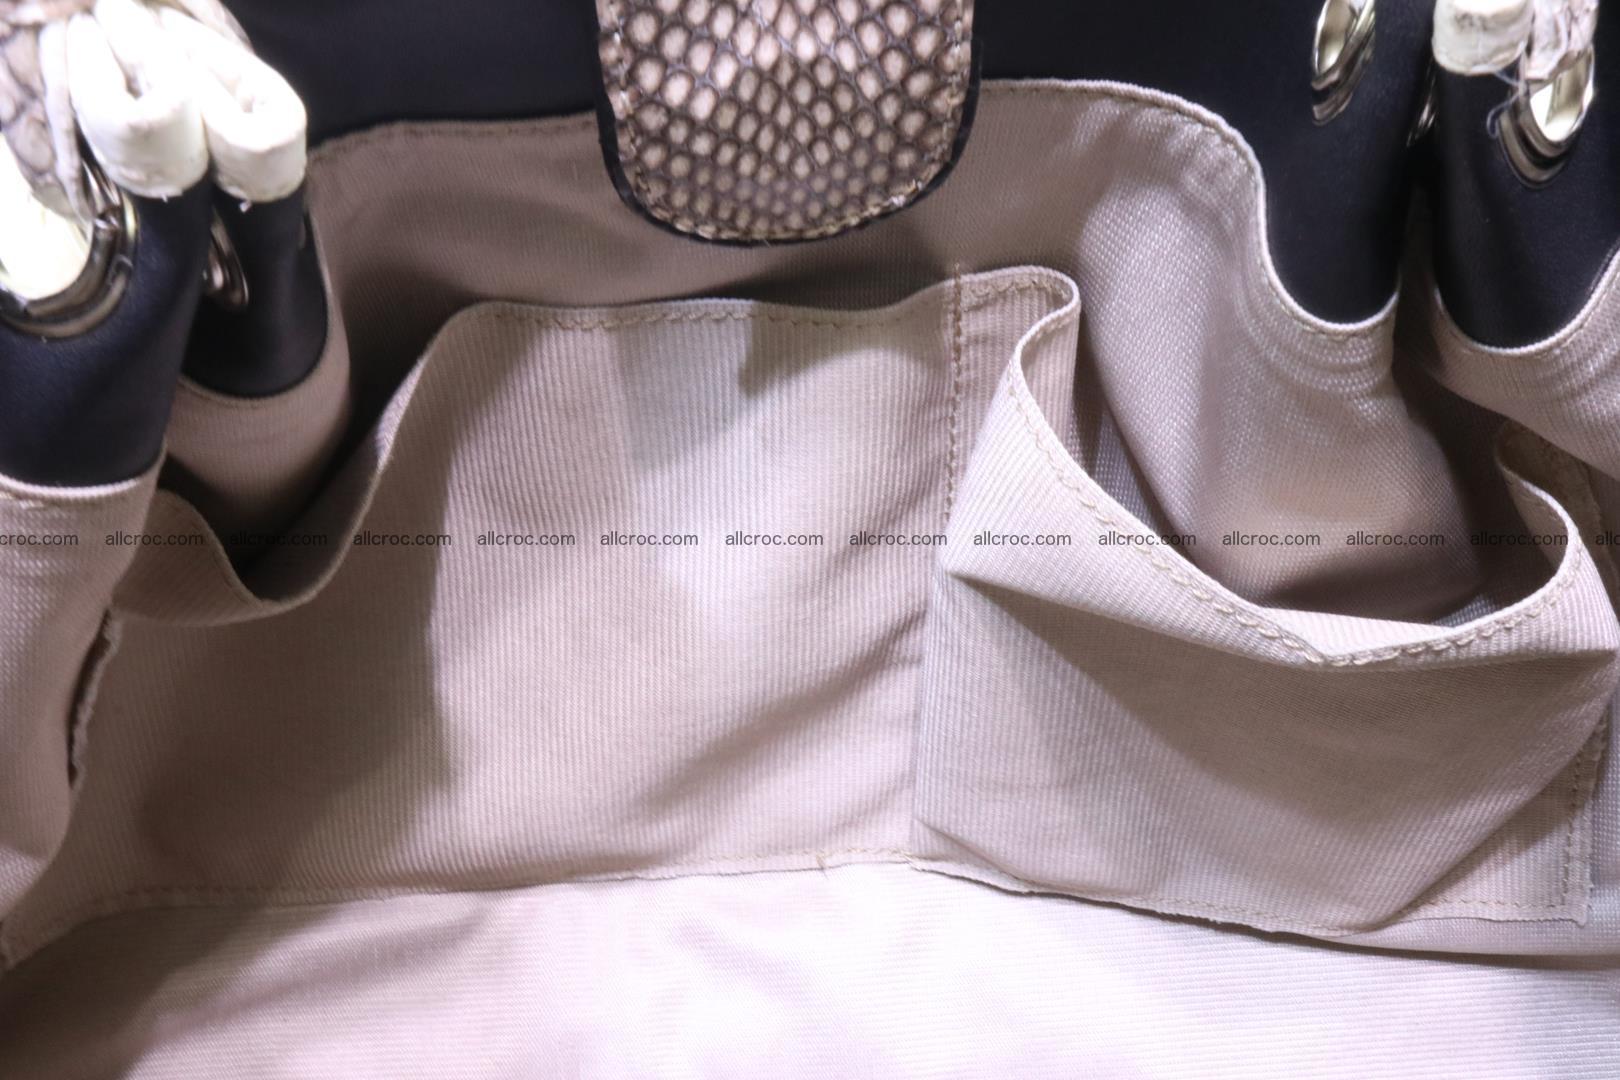 Handbag for lady from cobra skin with cobra head 169 Foto 16